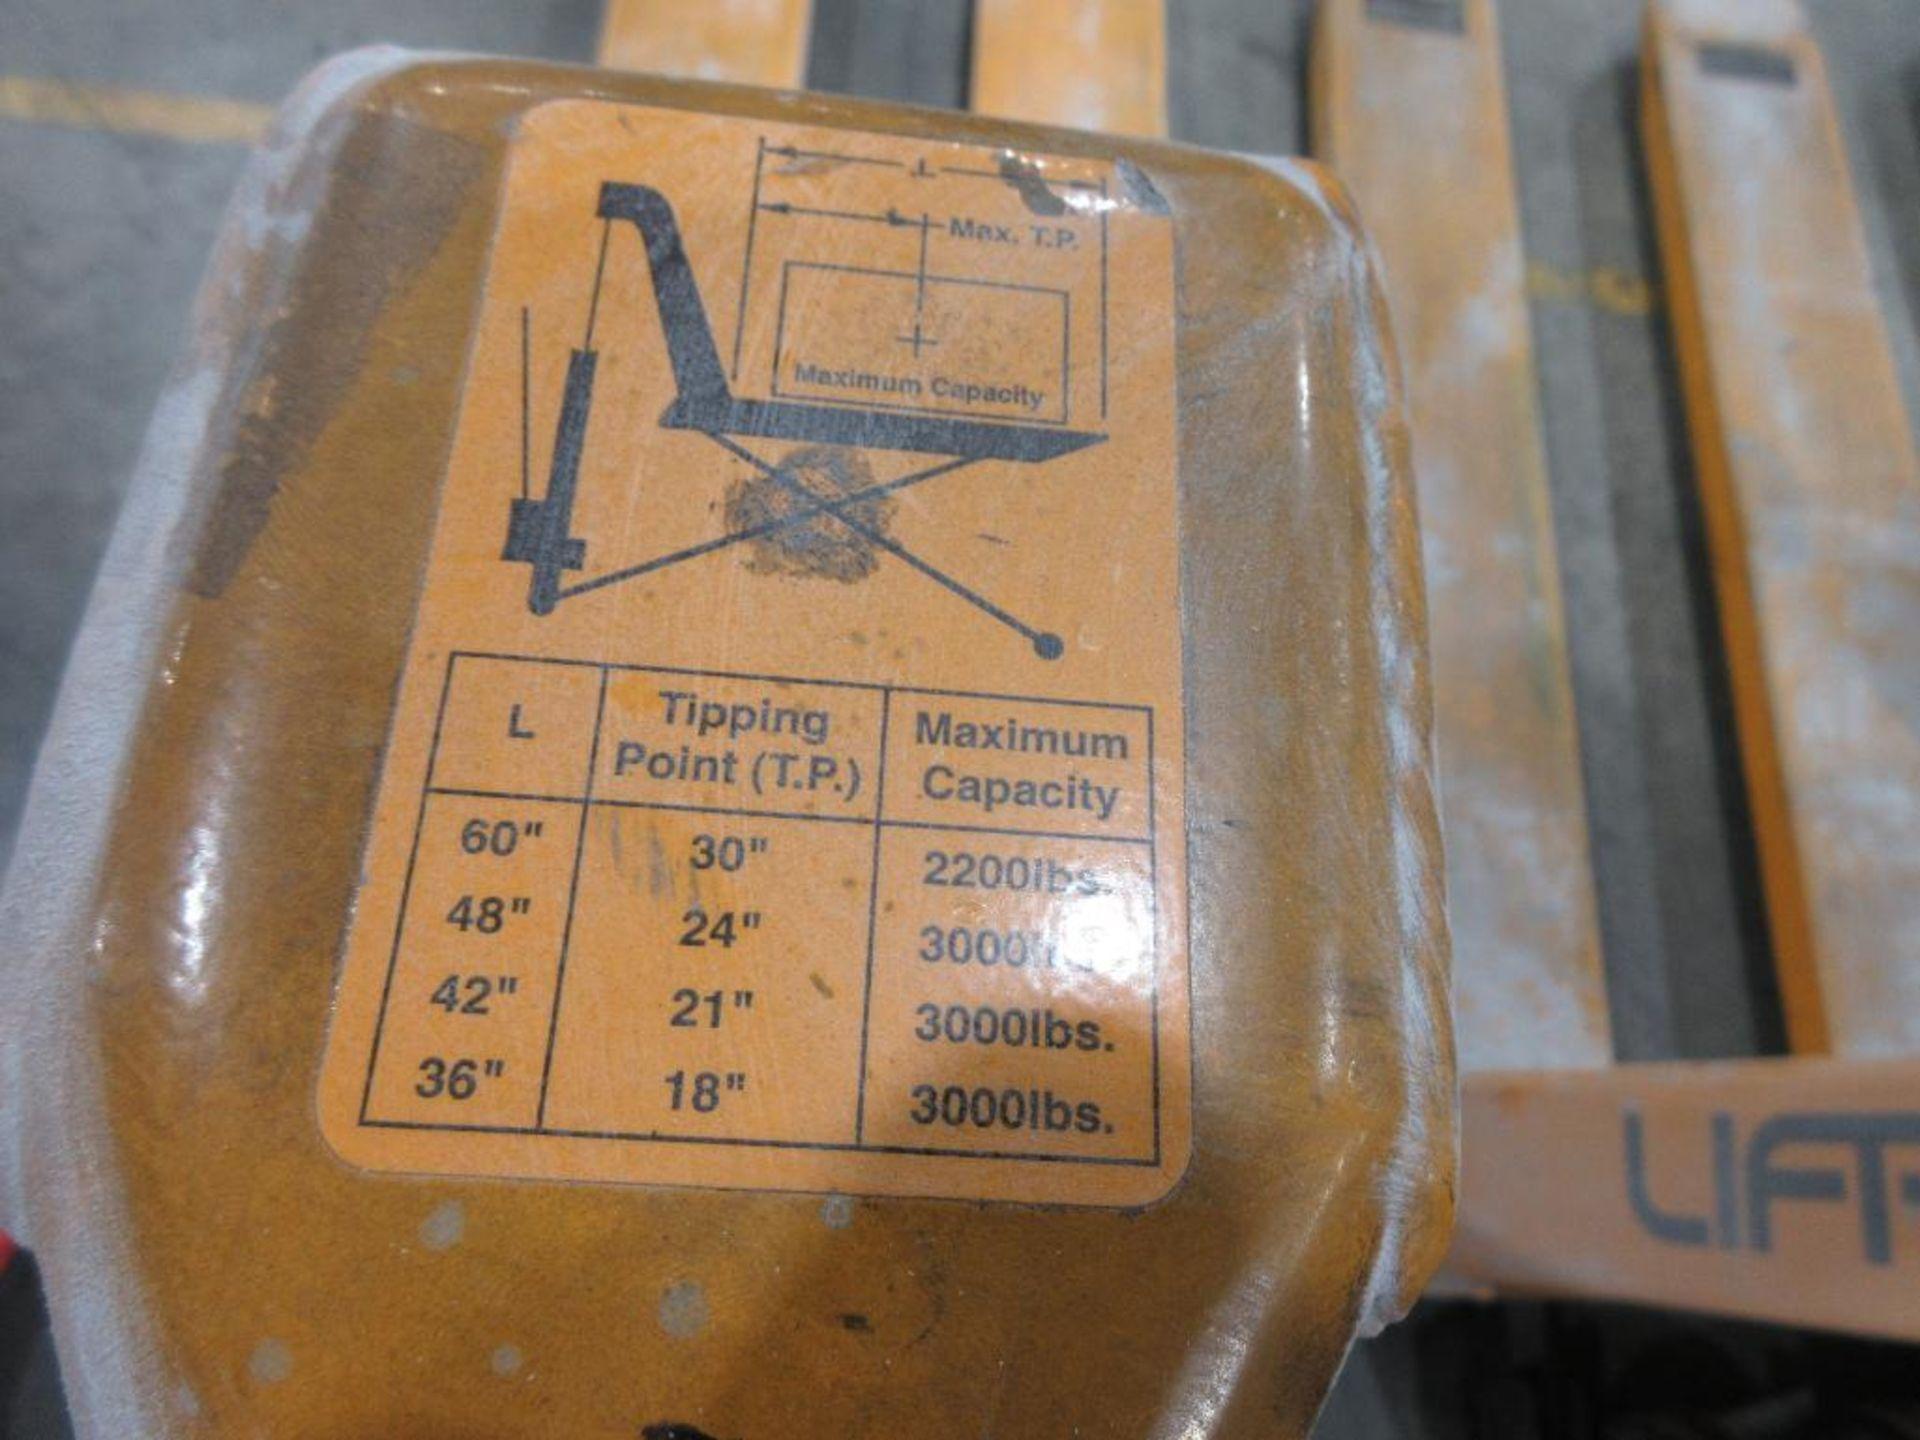 "Lift Rite 3,000 lb capacity pallet jack w 30"" scissor capability, model RG30M205048, 48"" forks - Image 2 of 2"